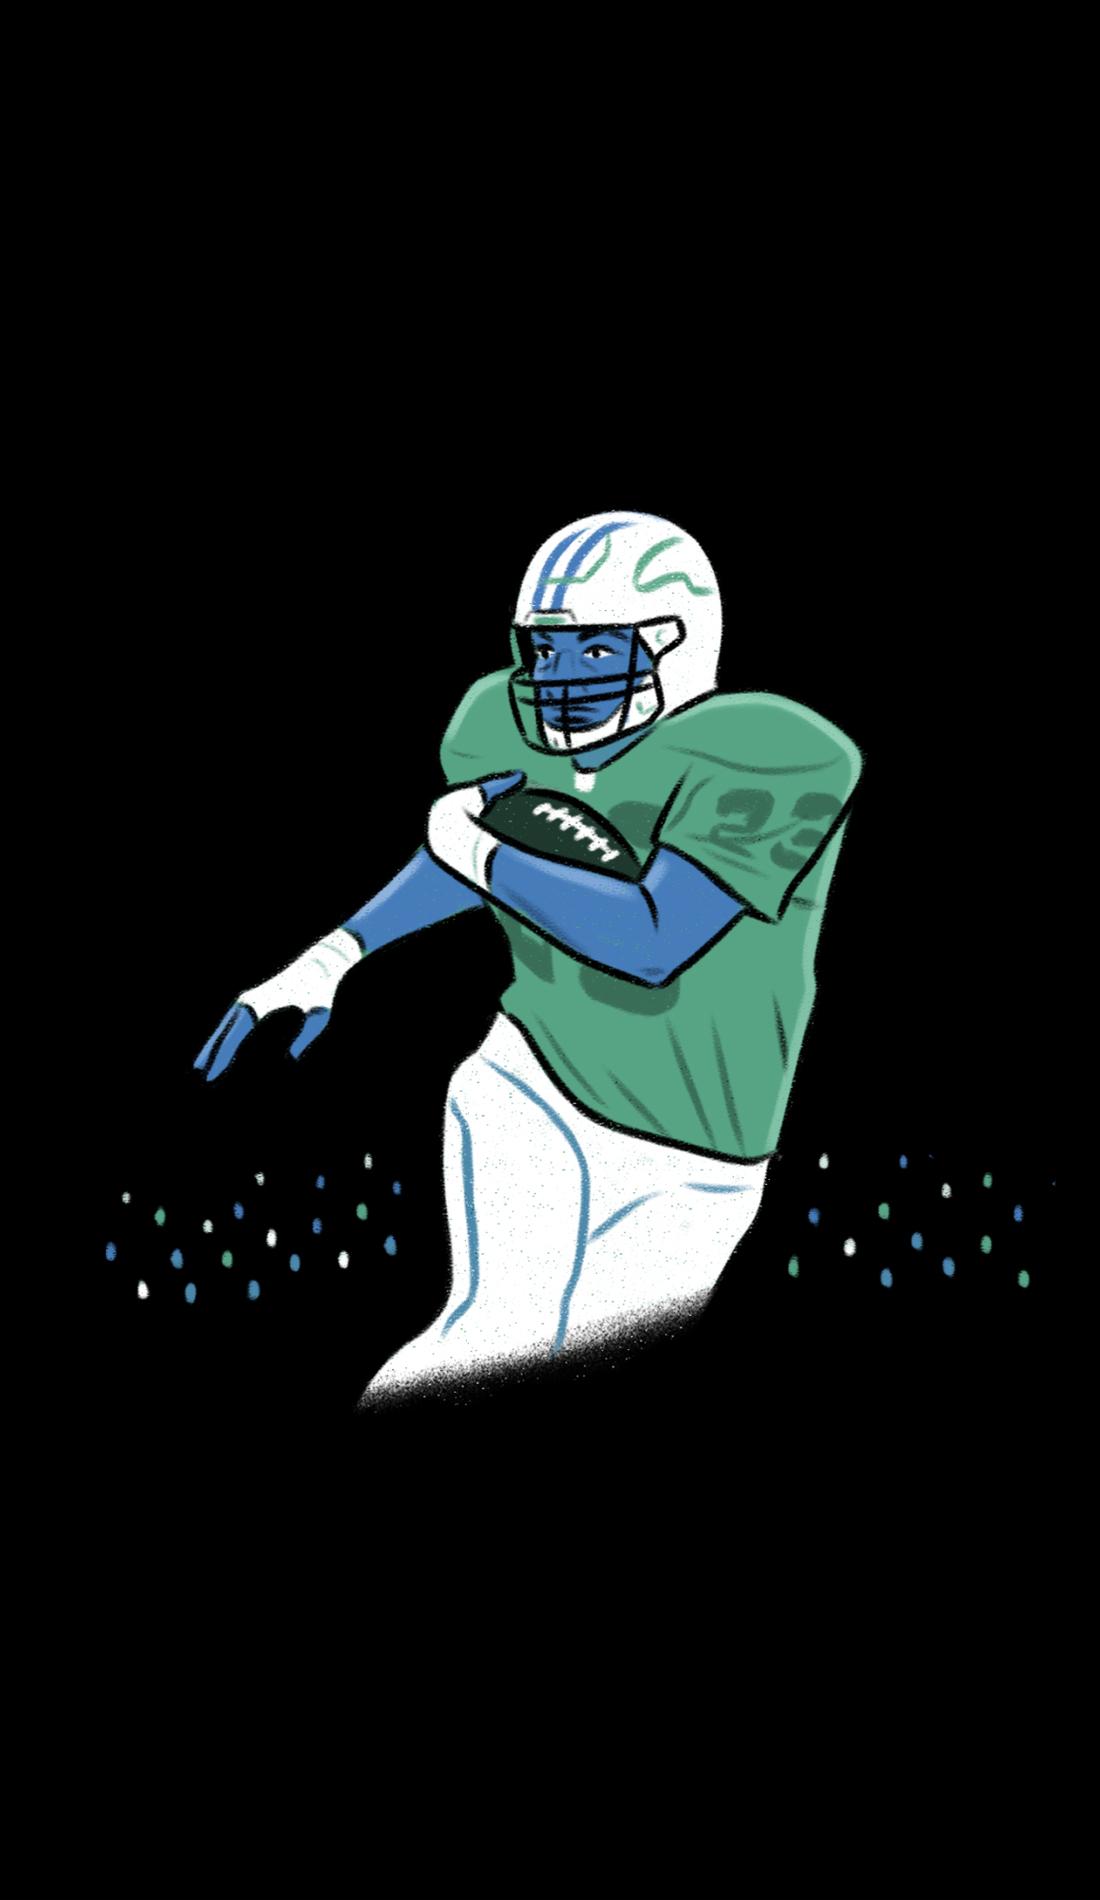 A Tennessee Tech Golden Eagles Football live event